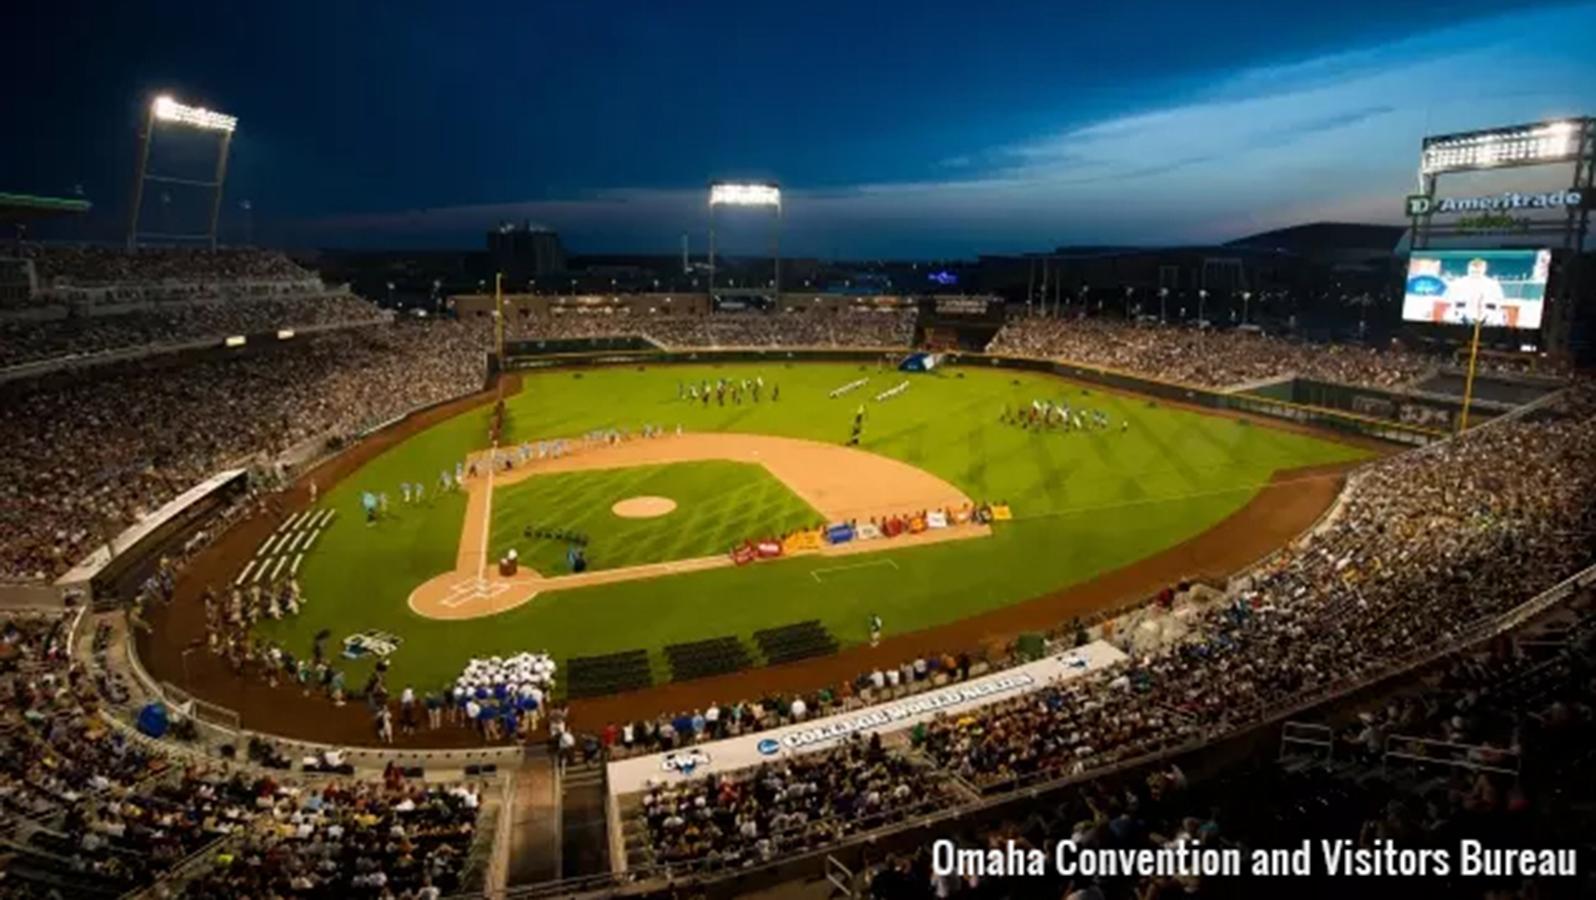 wide shot of Omaha baseball park